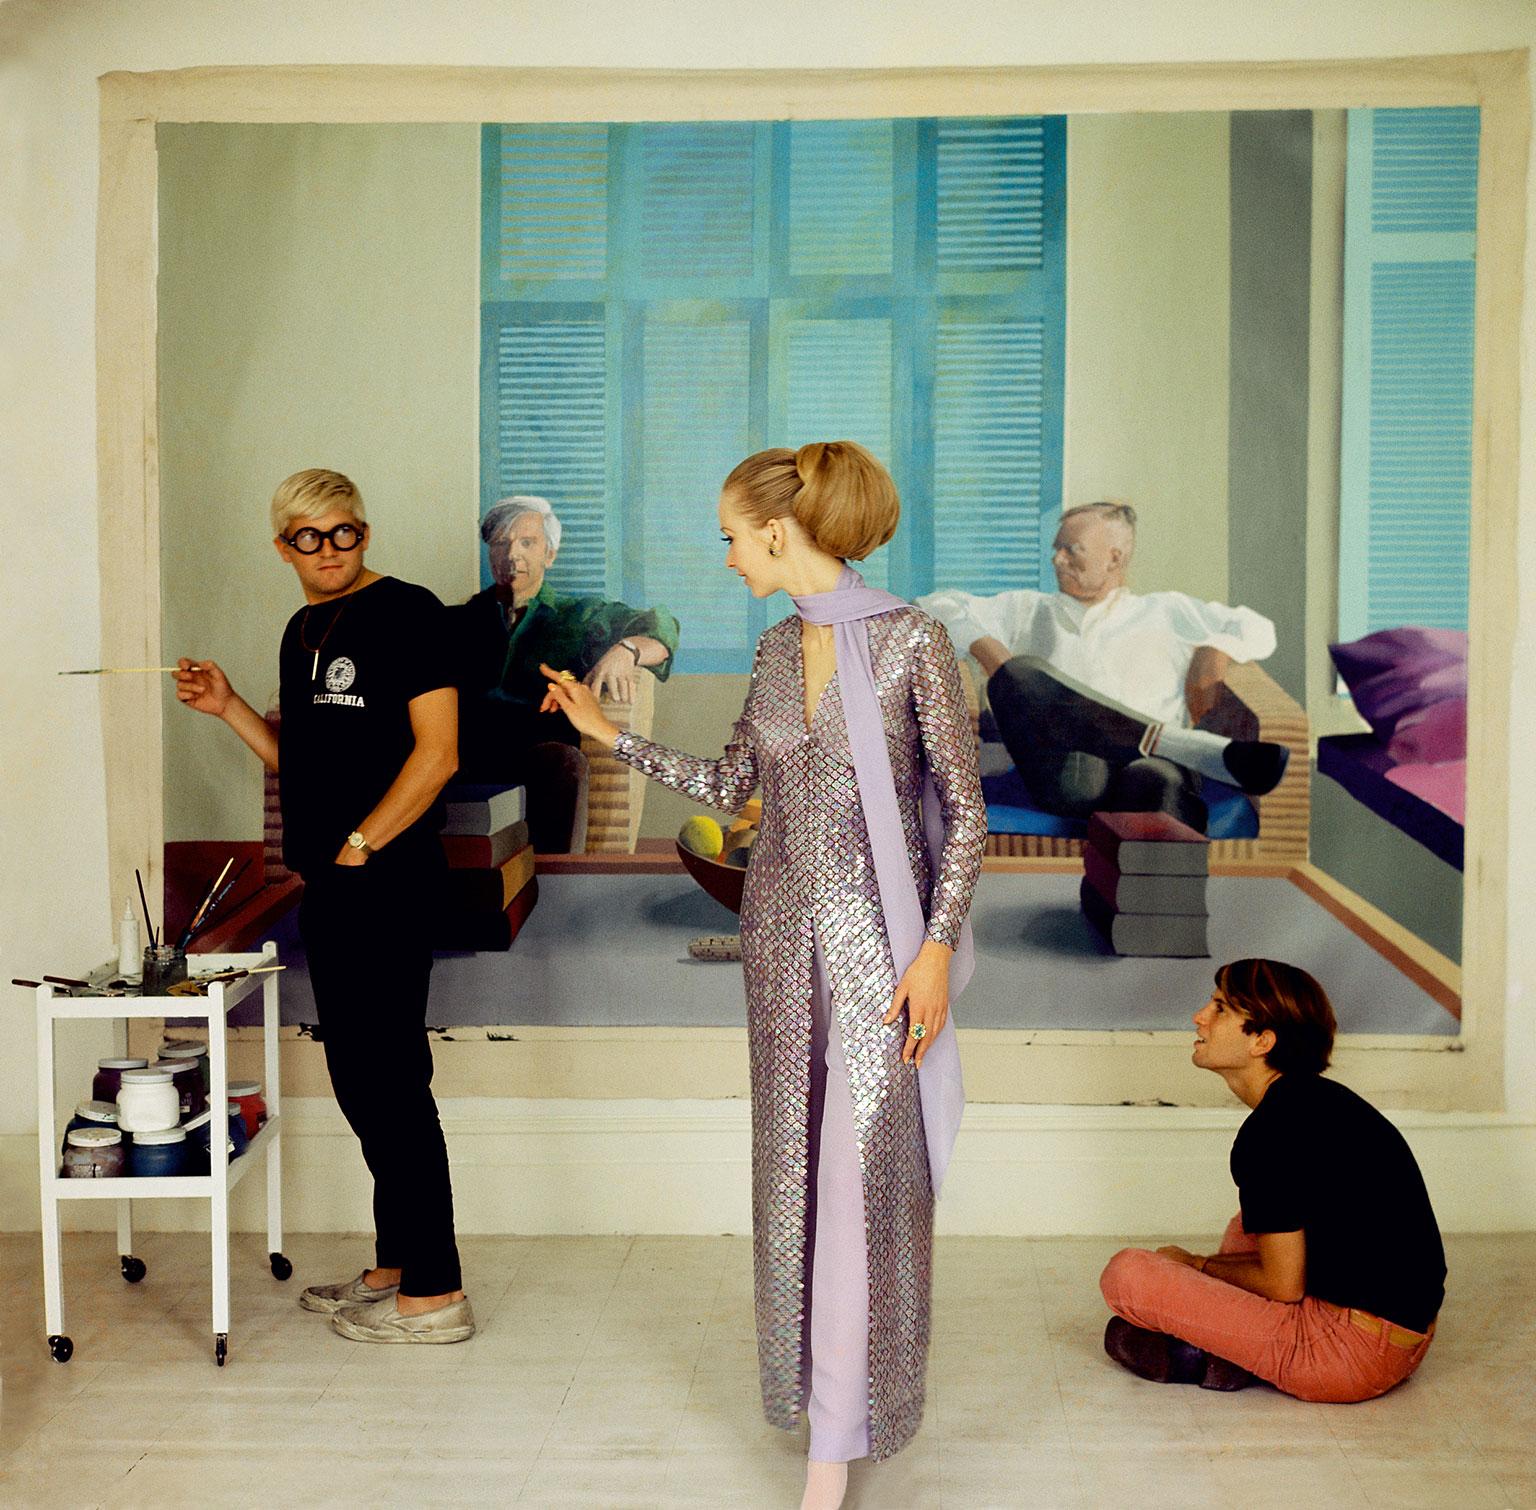 Cecil Beaton, David Hockney, Peter Schlesinger and Maudie James, 1968 Image: © The Condé Nast Publications Ltd